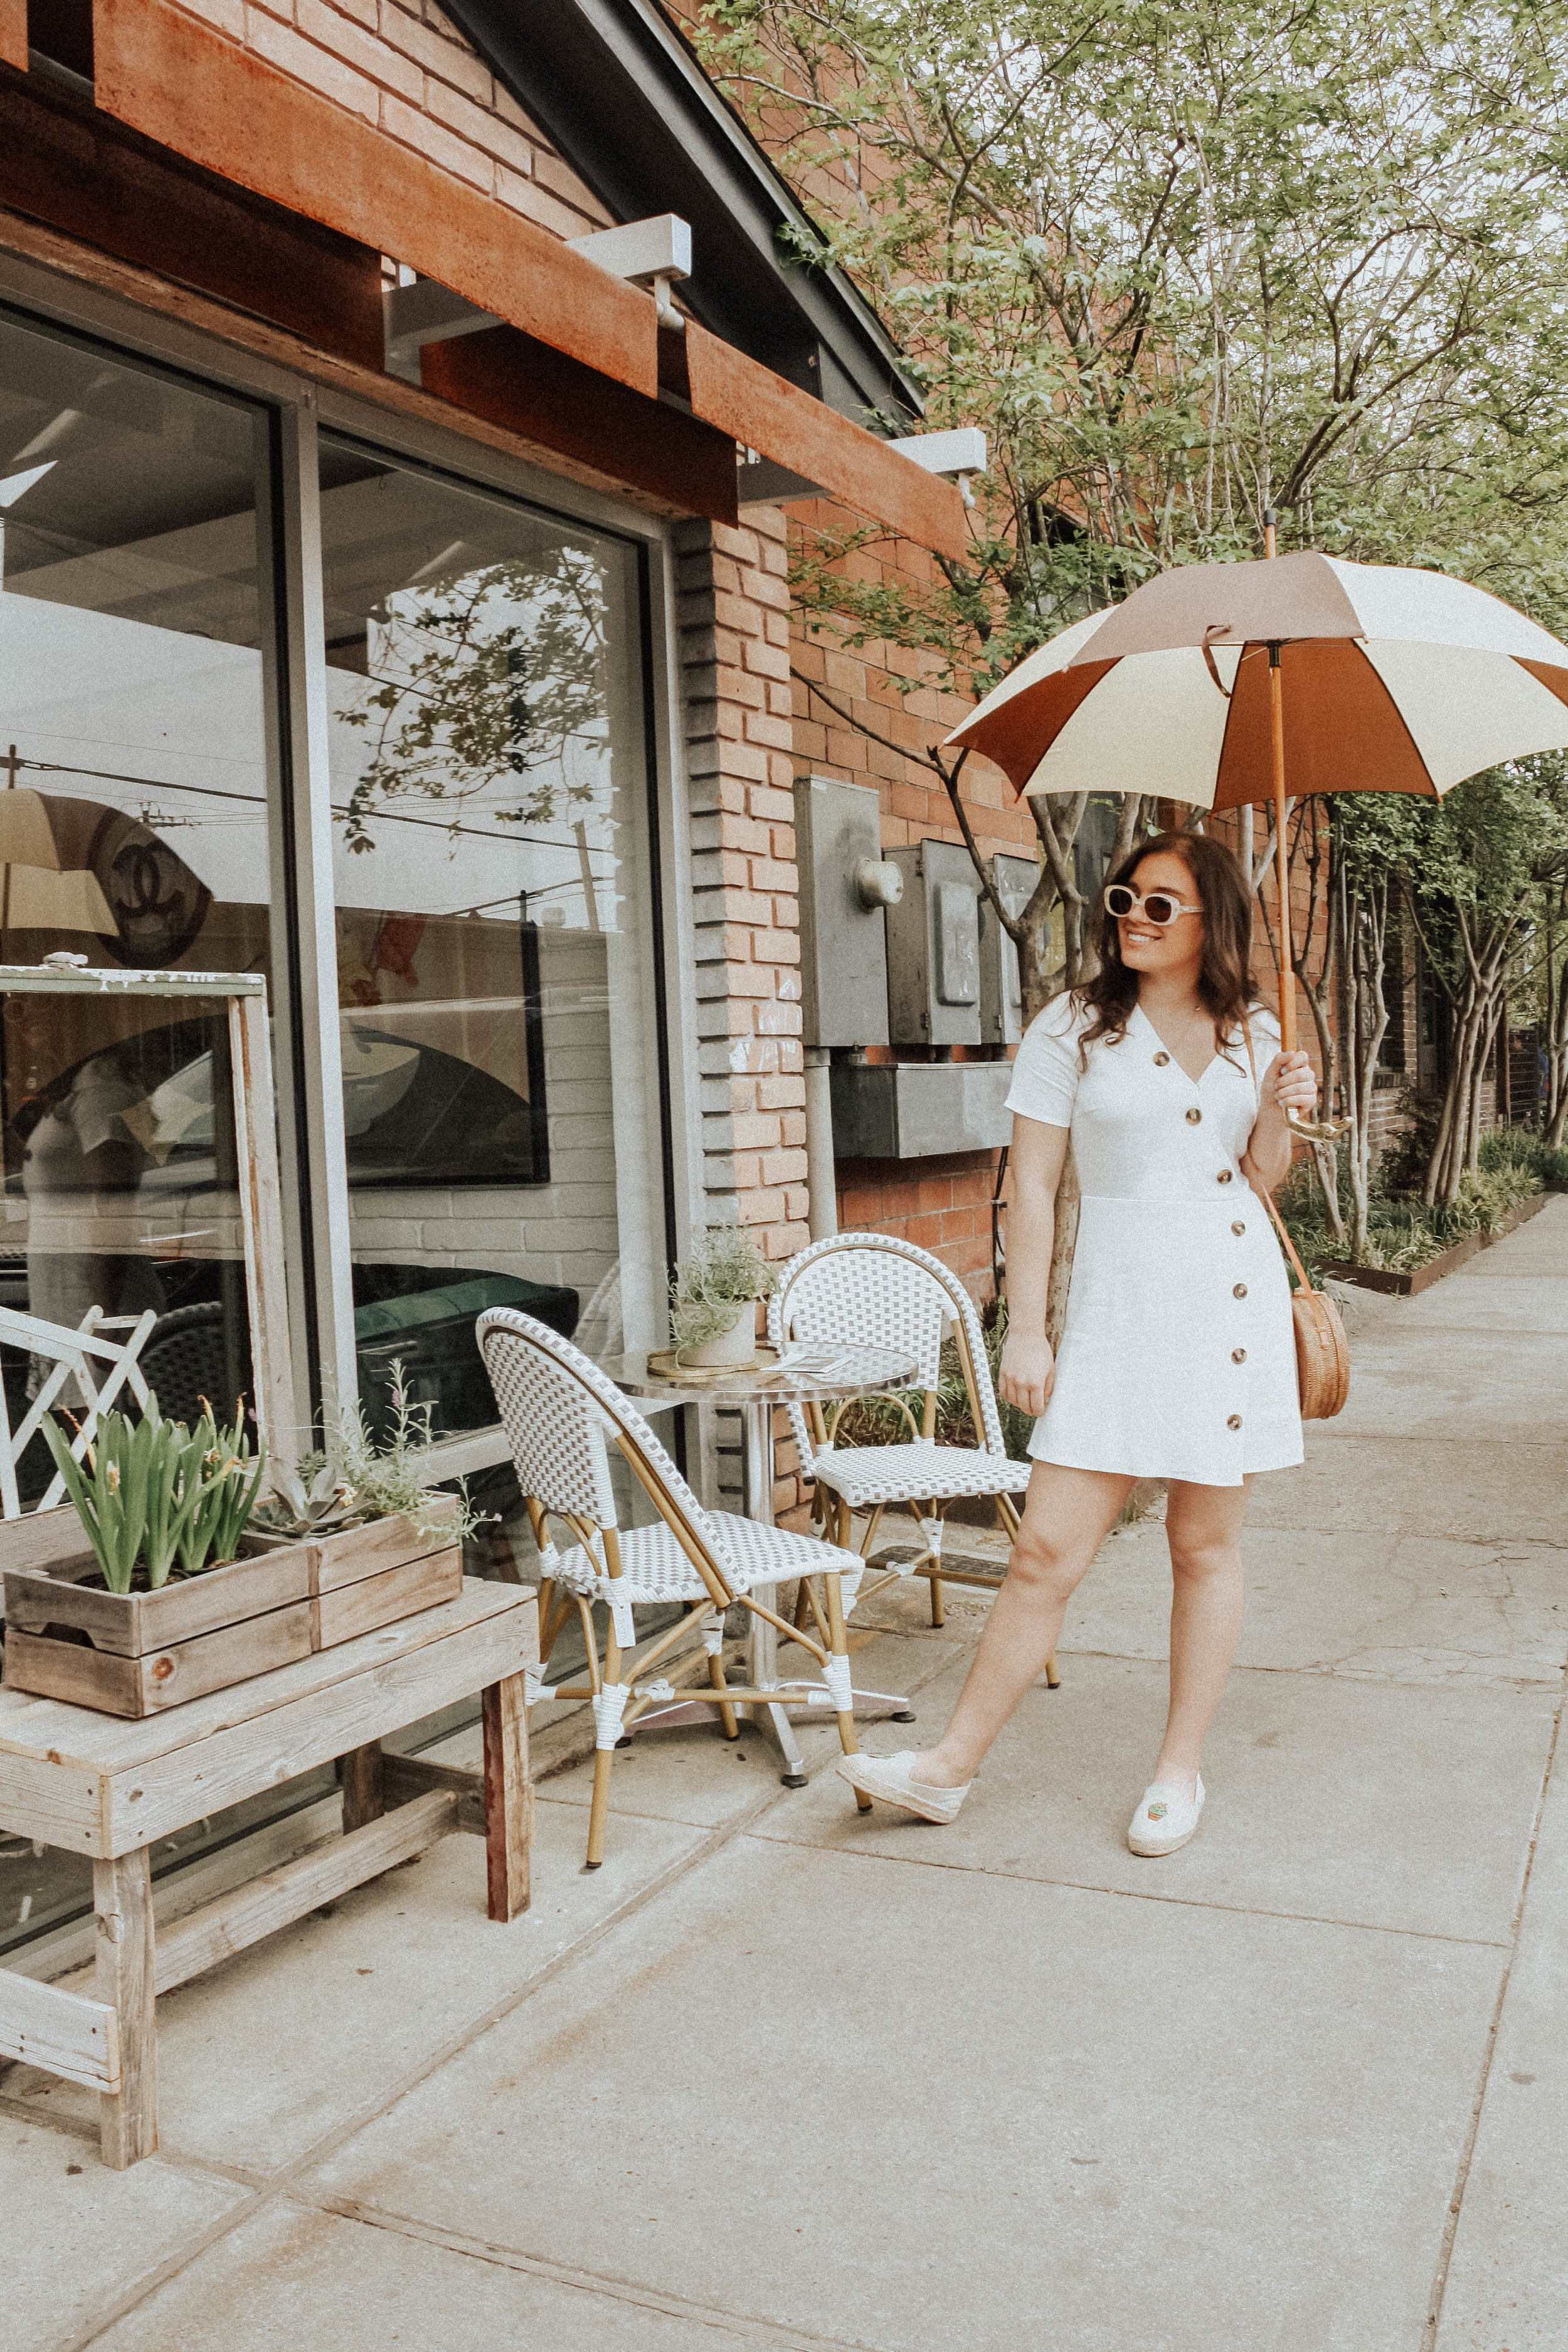 Sunglasses: Quay; Dress: Moon River; Purse: Cleobella; Shoes: Soludos